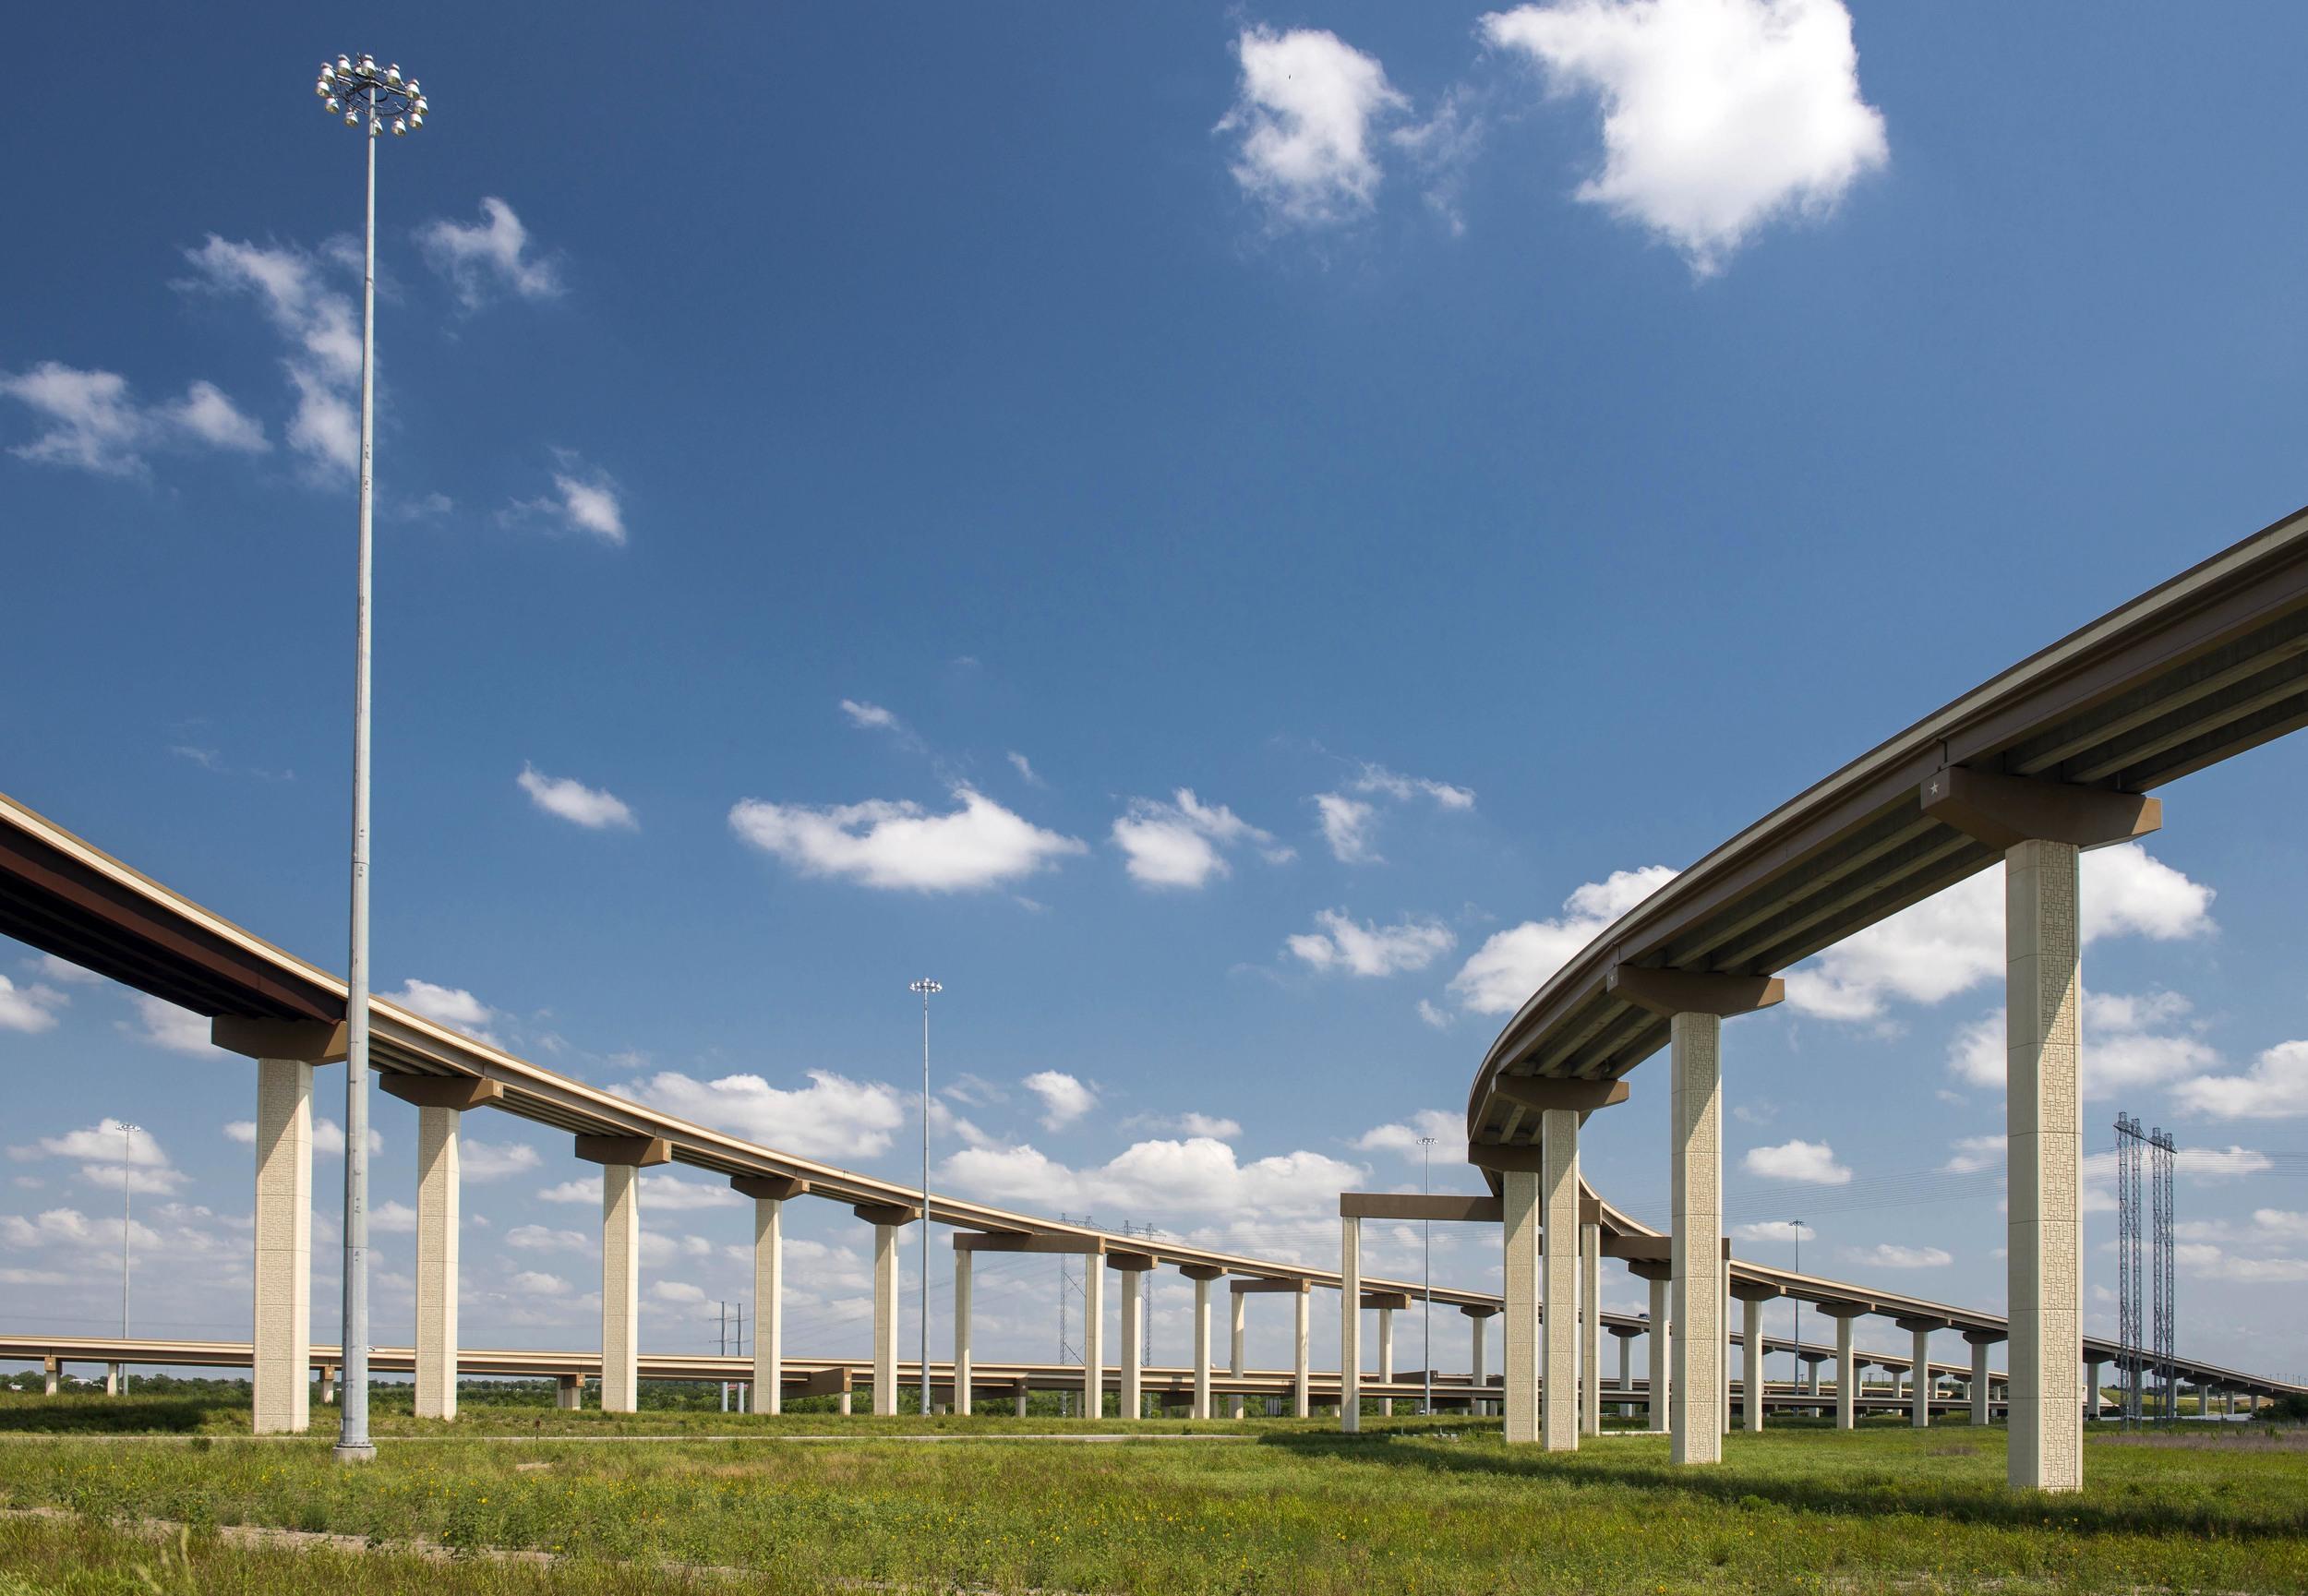 Texas_HWY_130_Toll_Road_201305_48.jpg